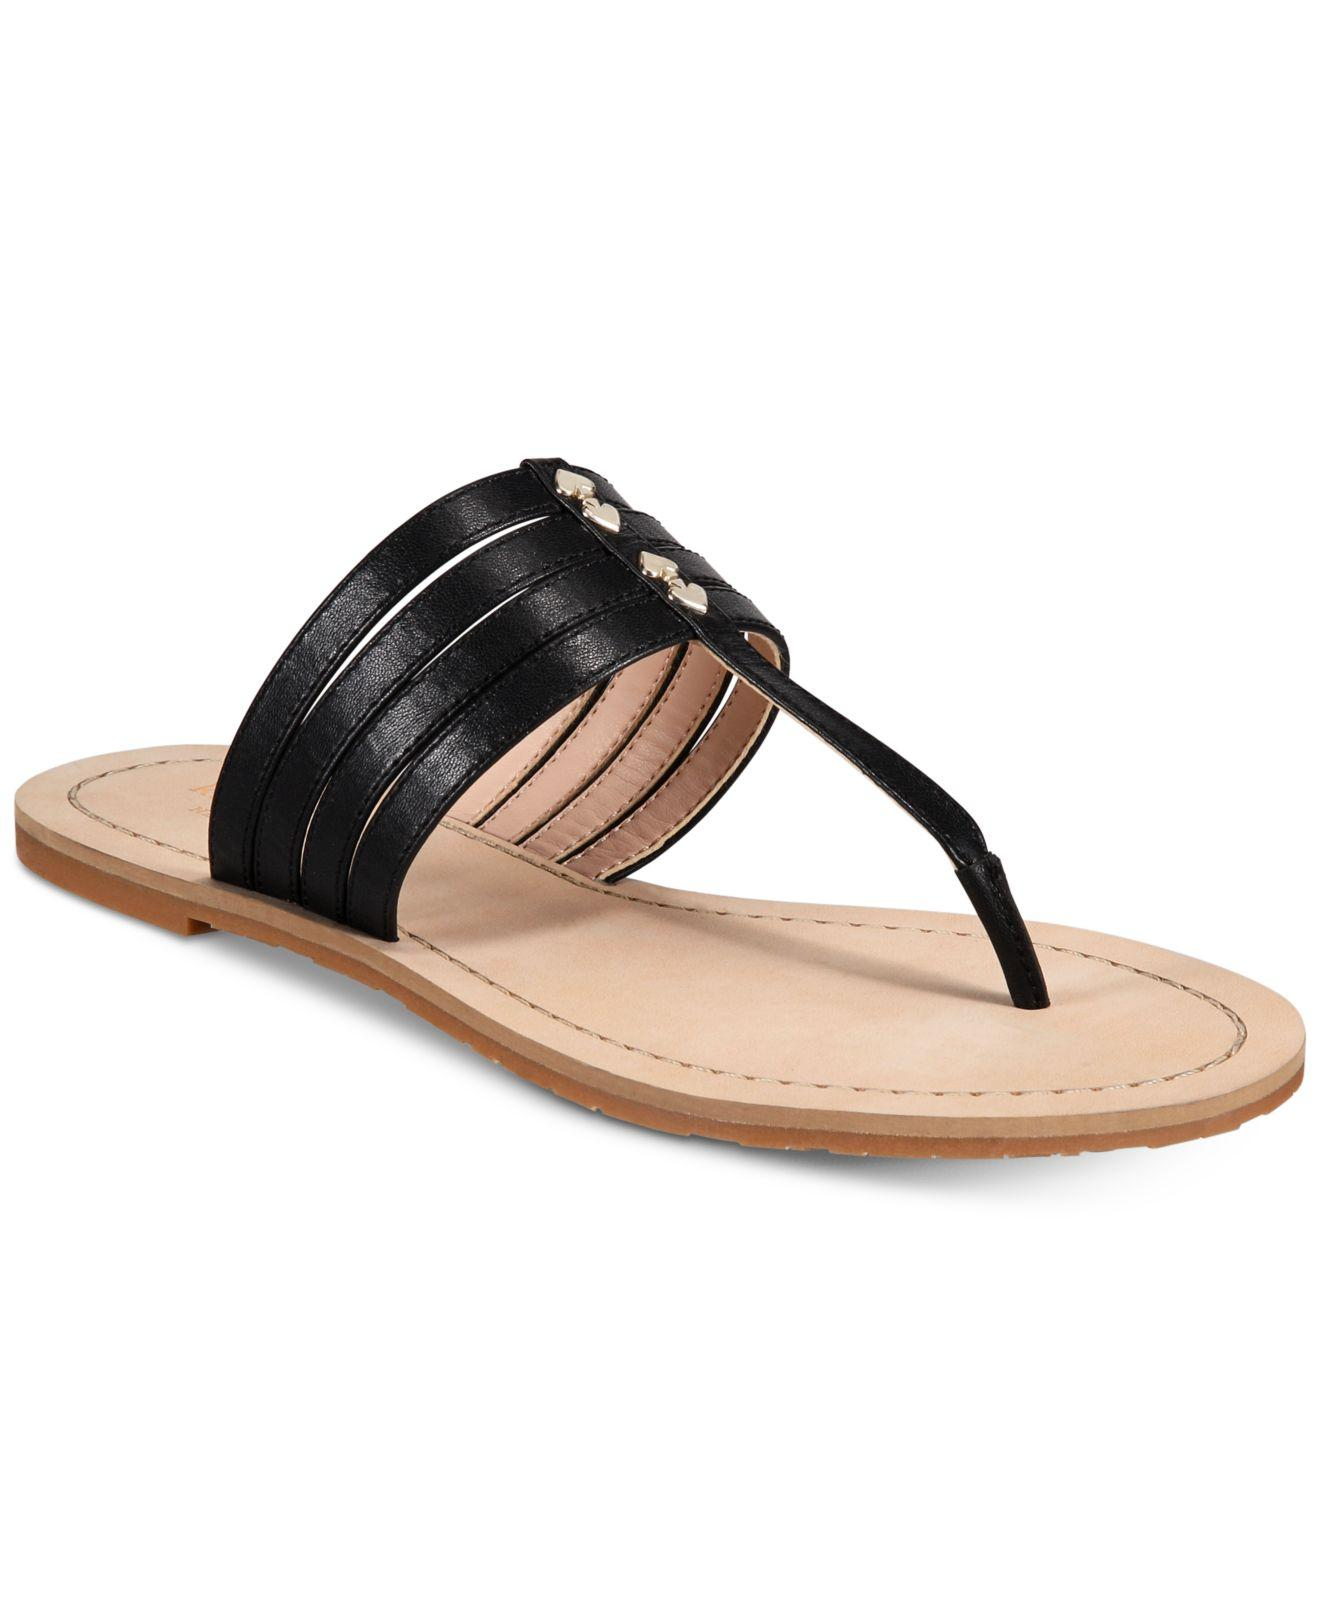 1a479279dc35 Lyst - Kate Spade Sindy Sandals in Black